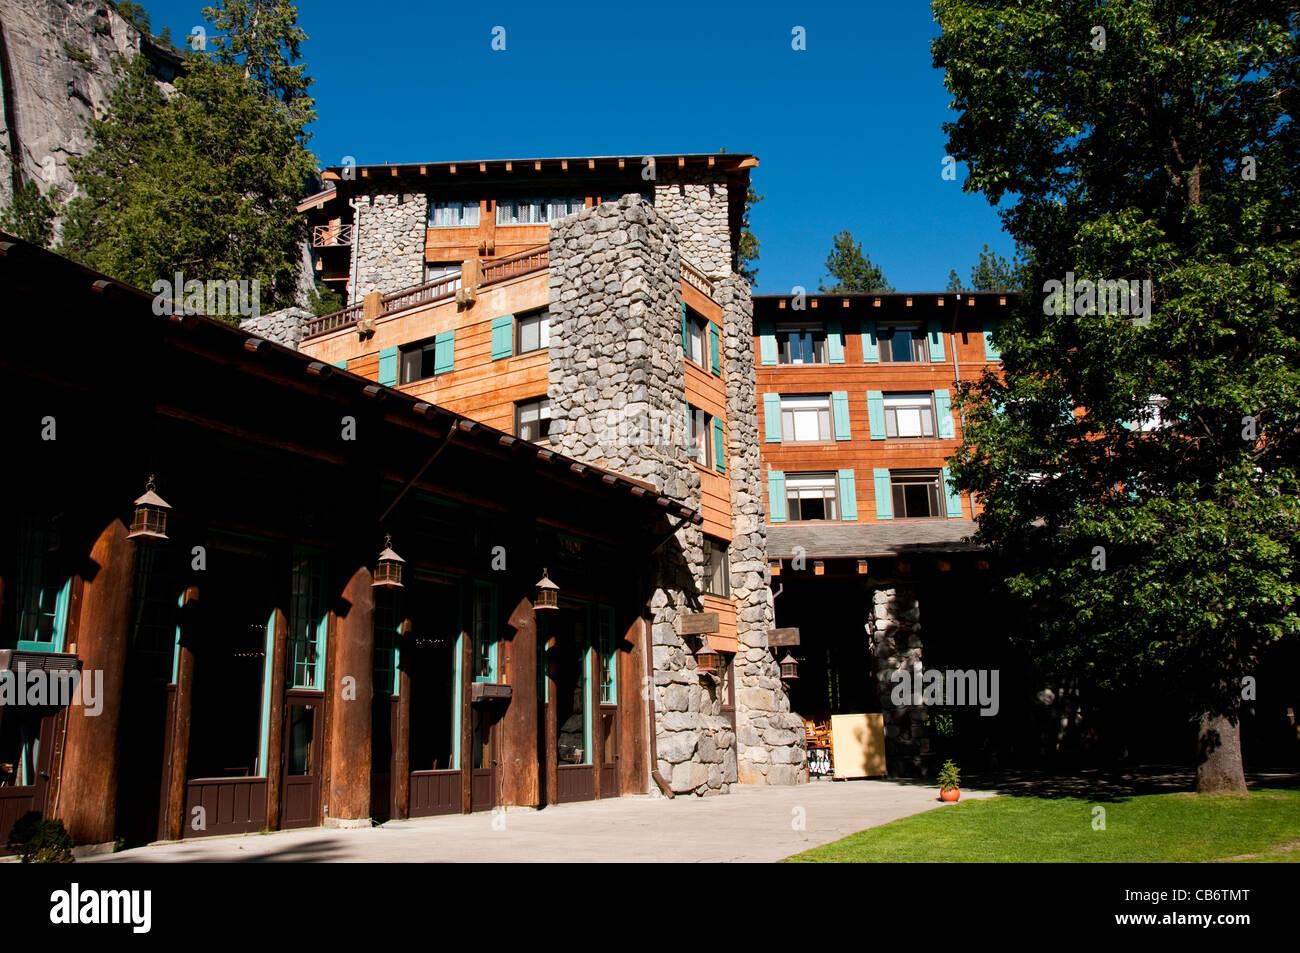 5796a2b182d44a Exterior of Ahwahnee Hotel Yosemite Valley Yosemite National Park lodging  California